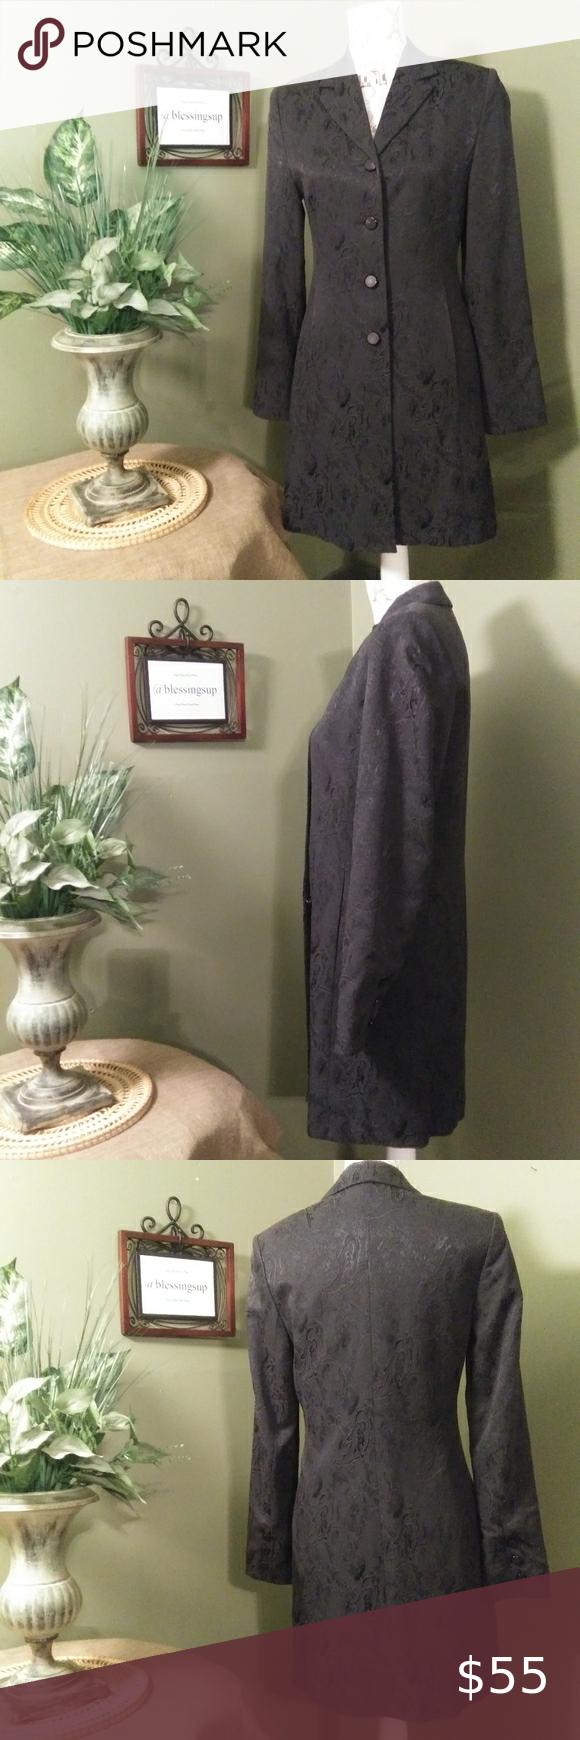 Vintage Klementi Black Jacket - Size EU36 Vintage